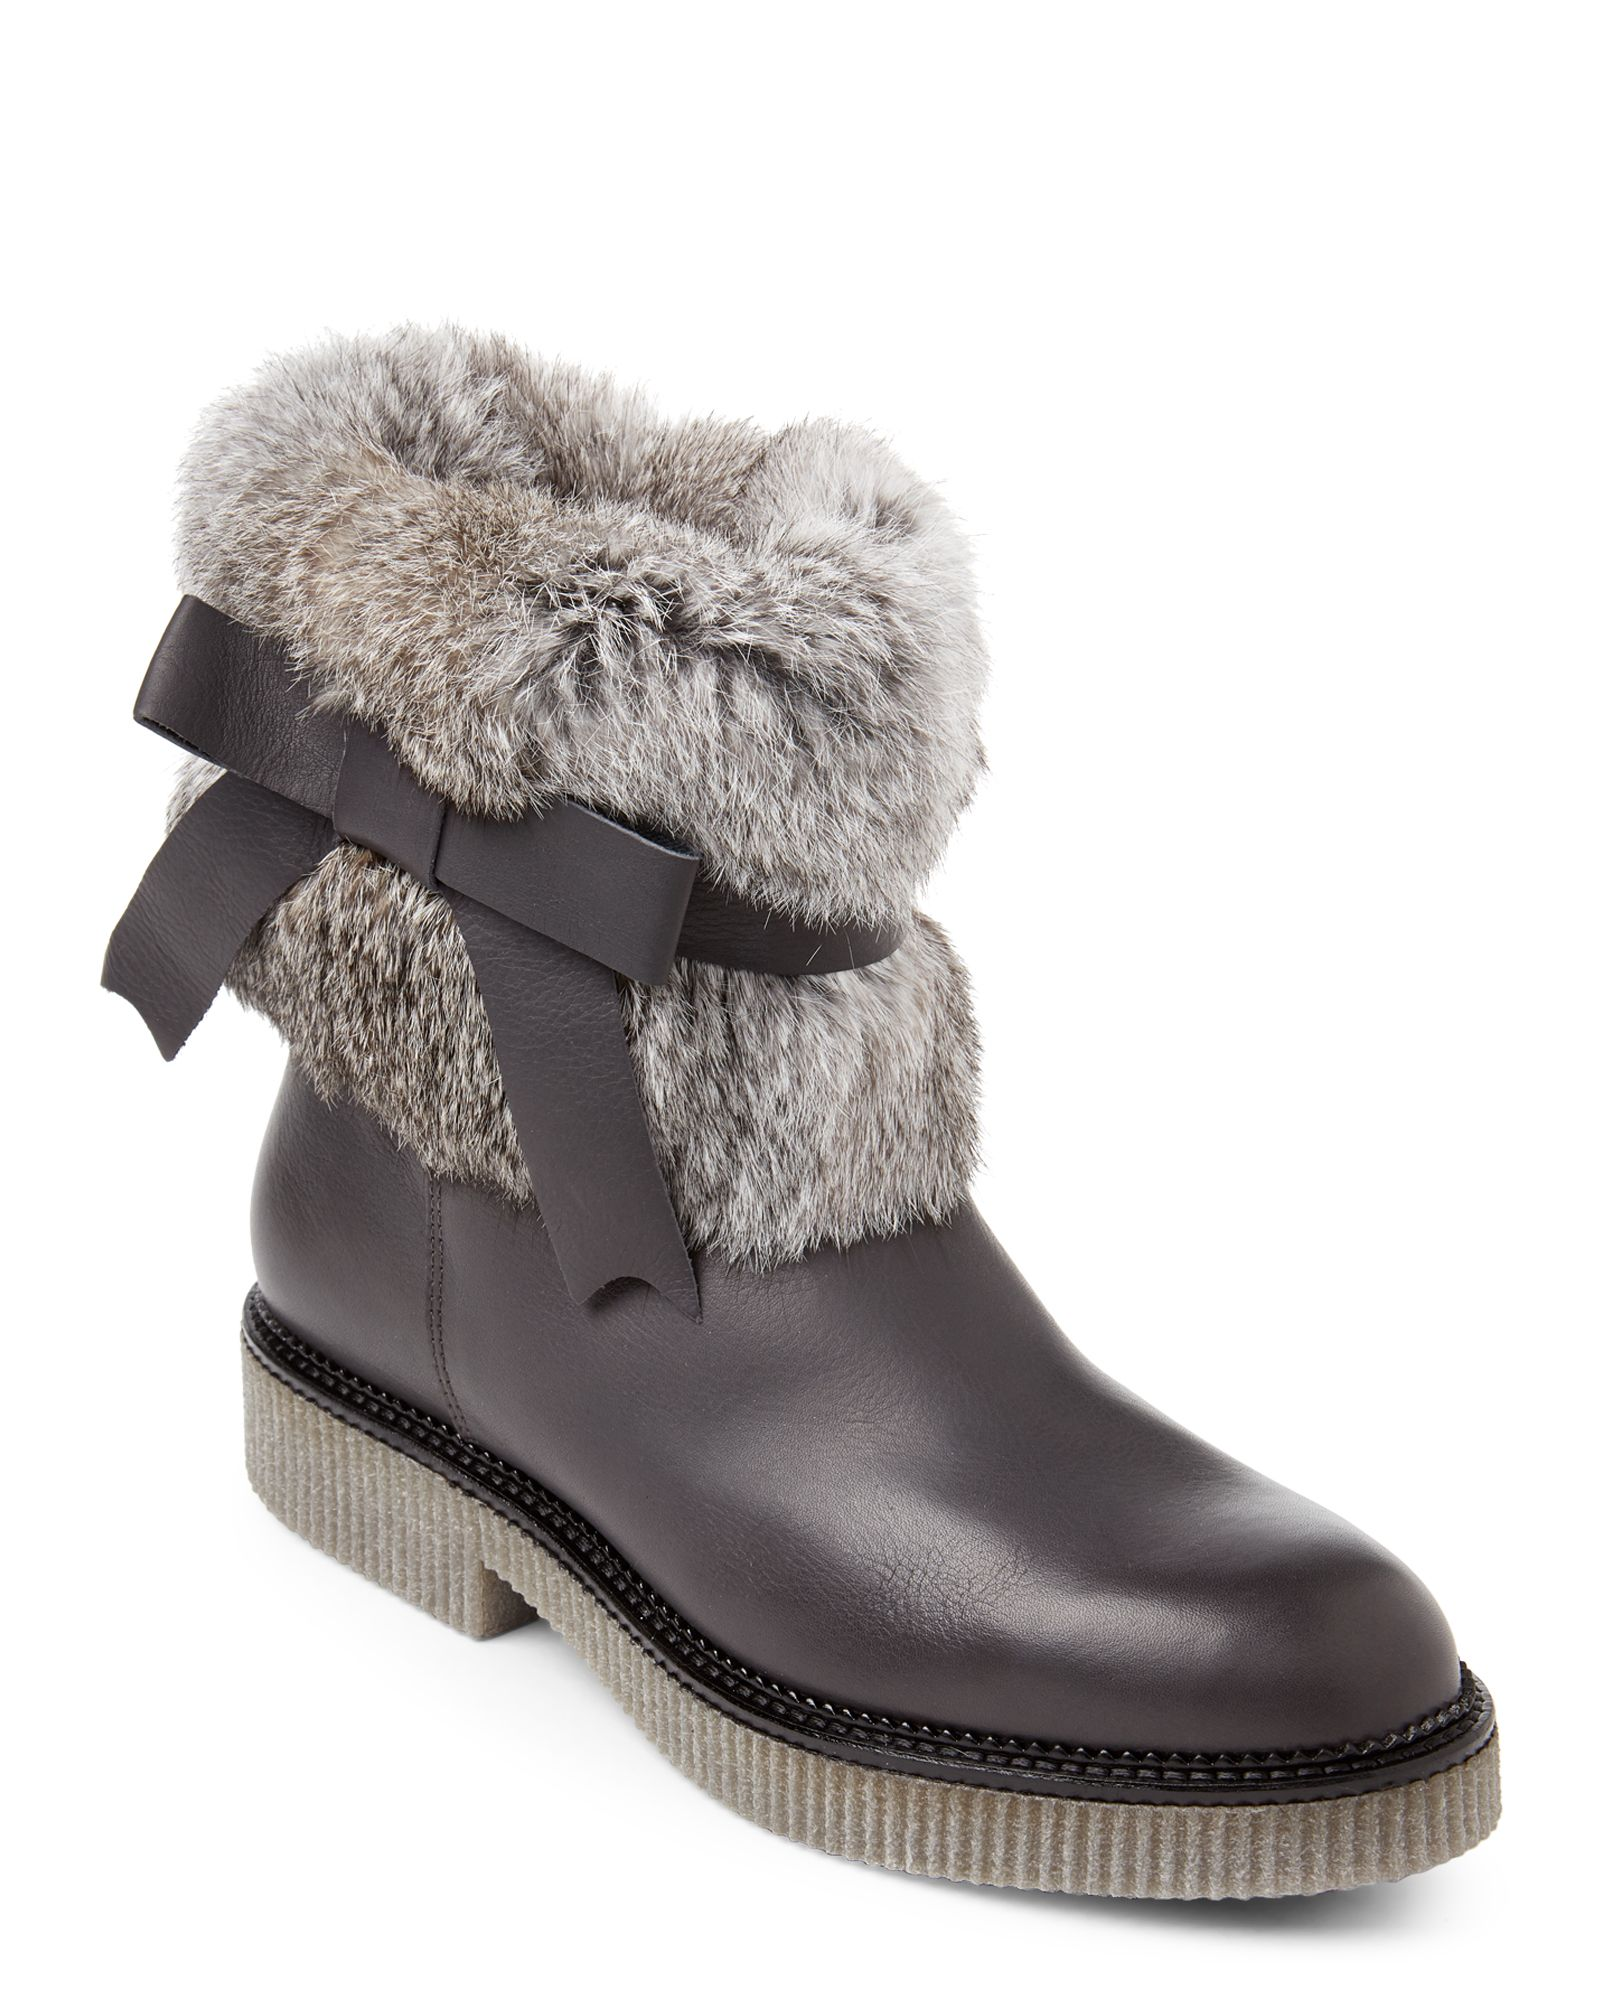 Elena Womens Full Grain Leather Flat Knee High Zip Boots Tan Brown